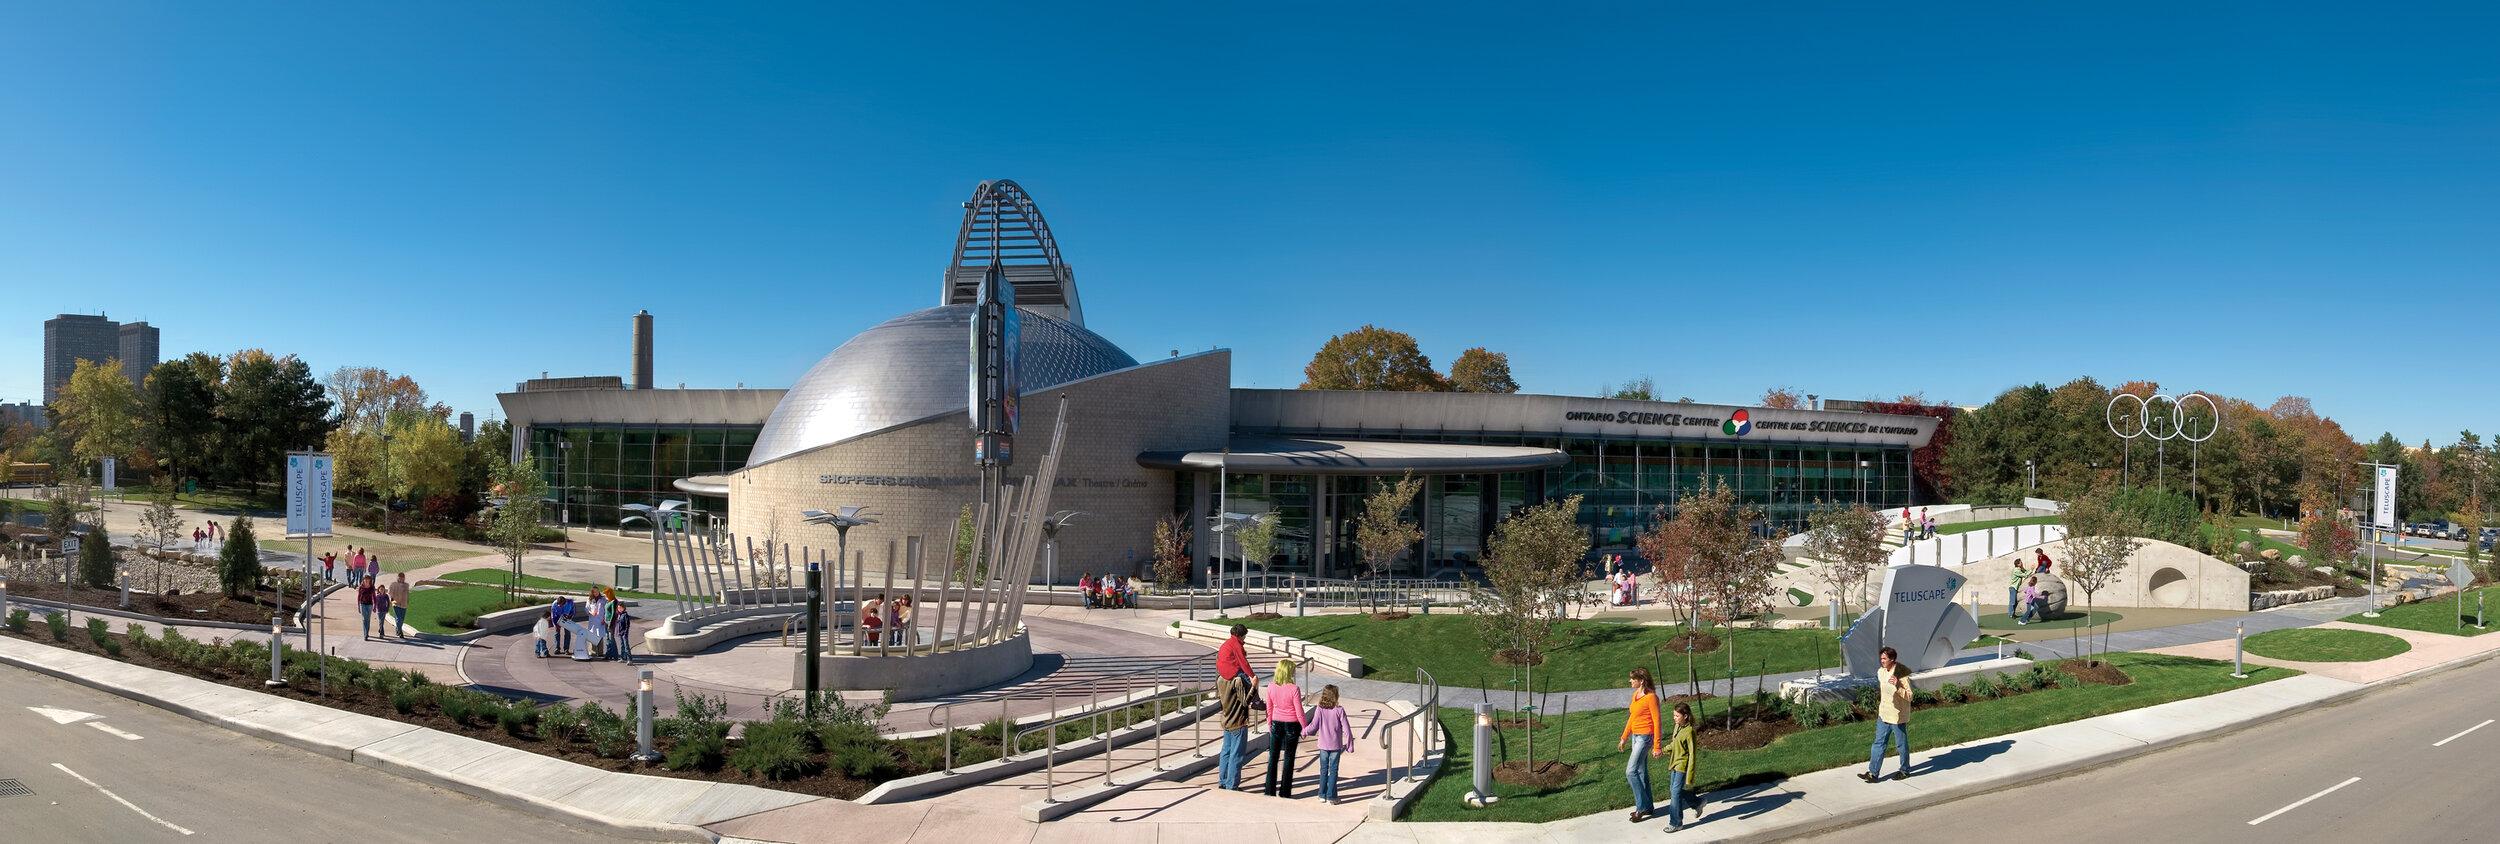 PHOTO: Ontario Science Centre